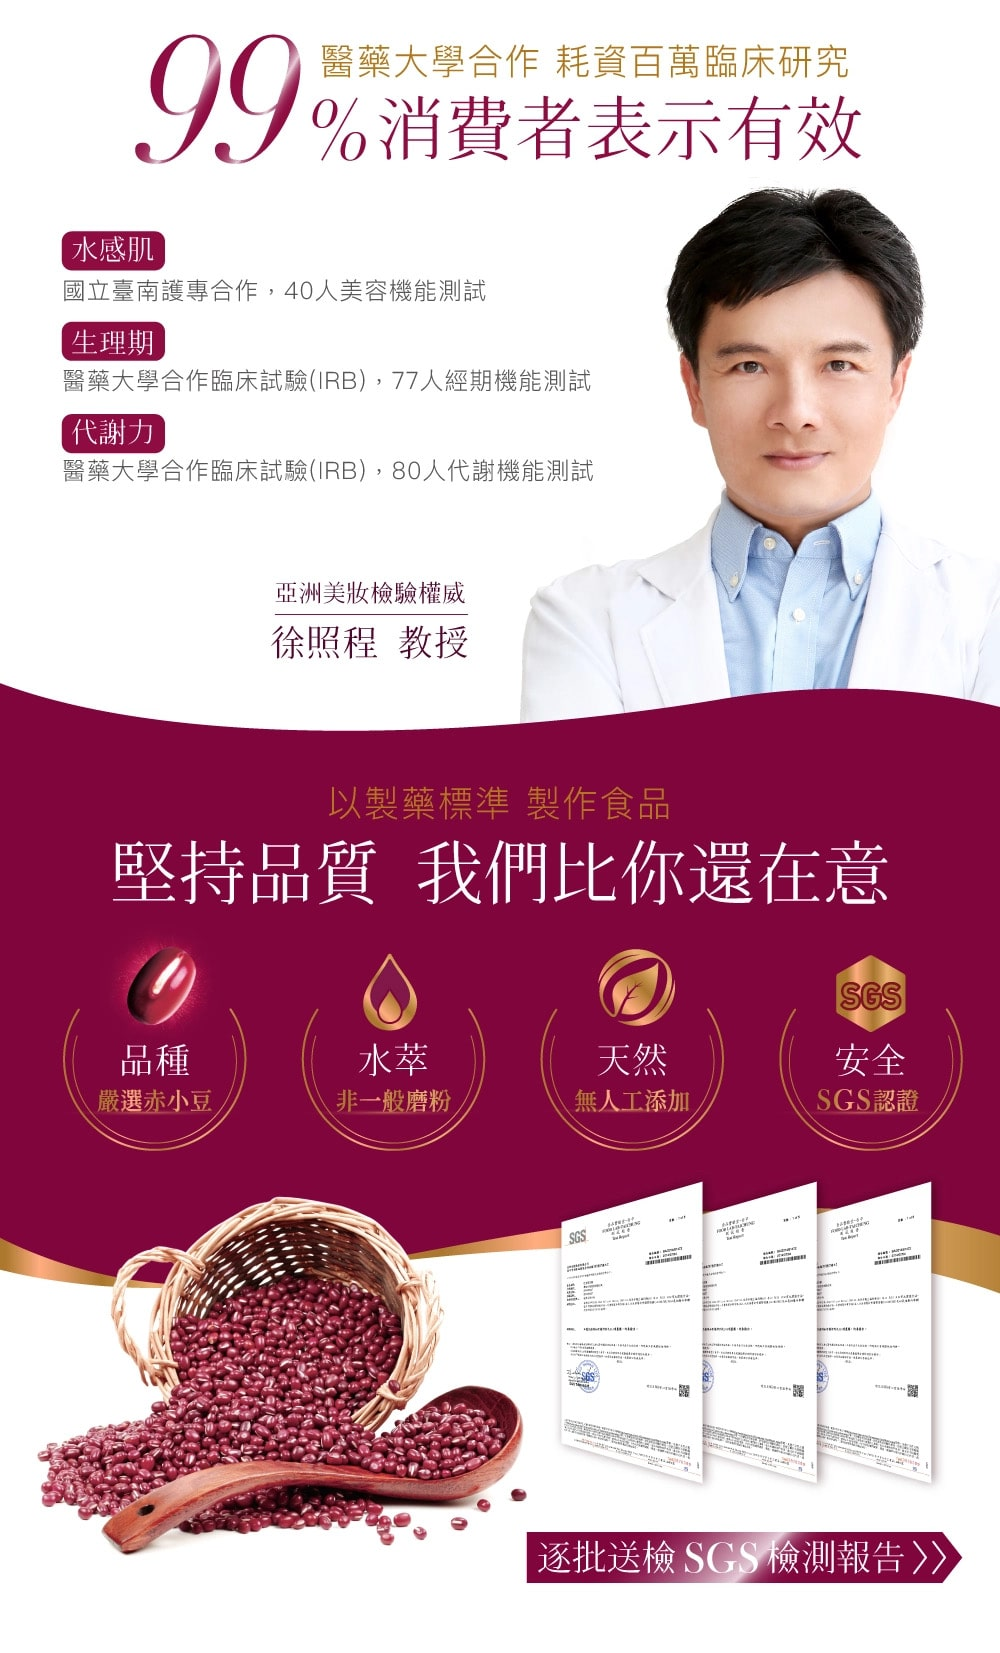 Berry Polyphenol Red Bean - Guarantee